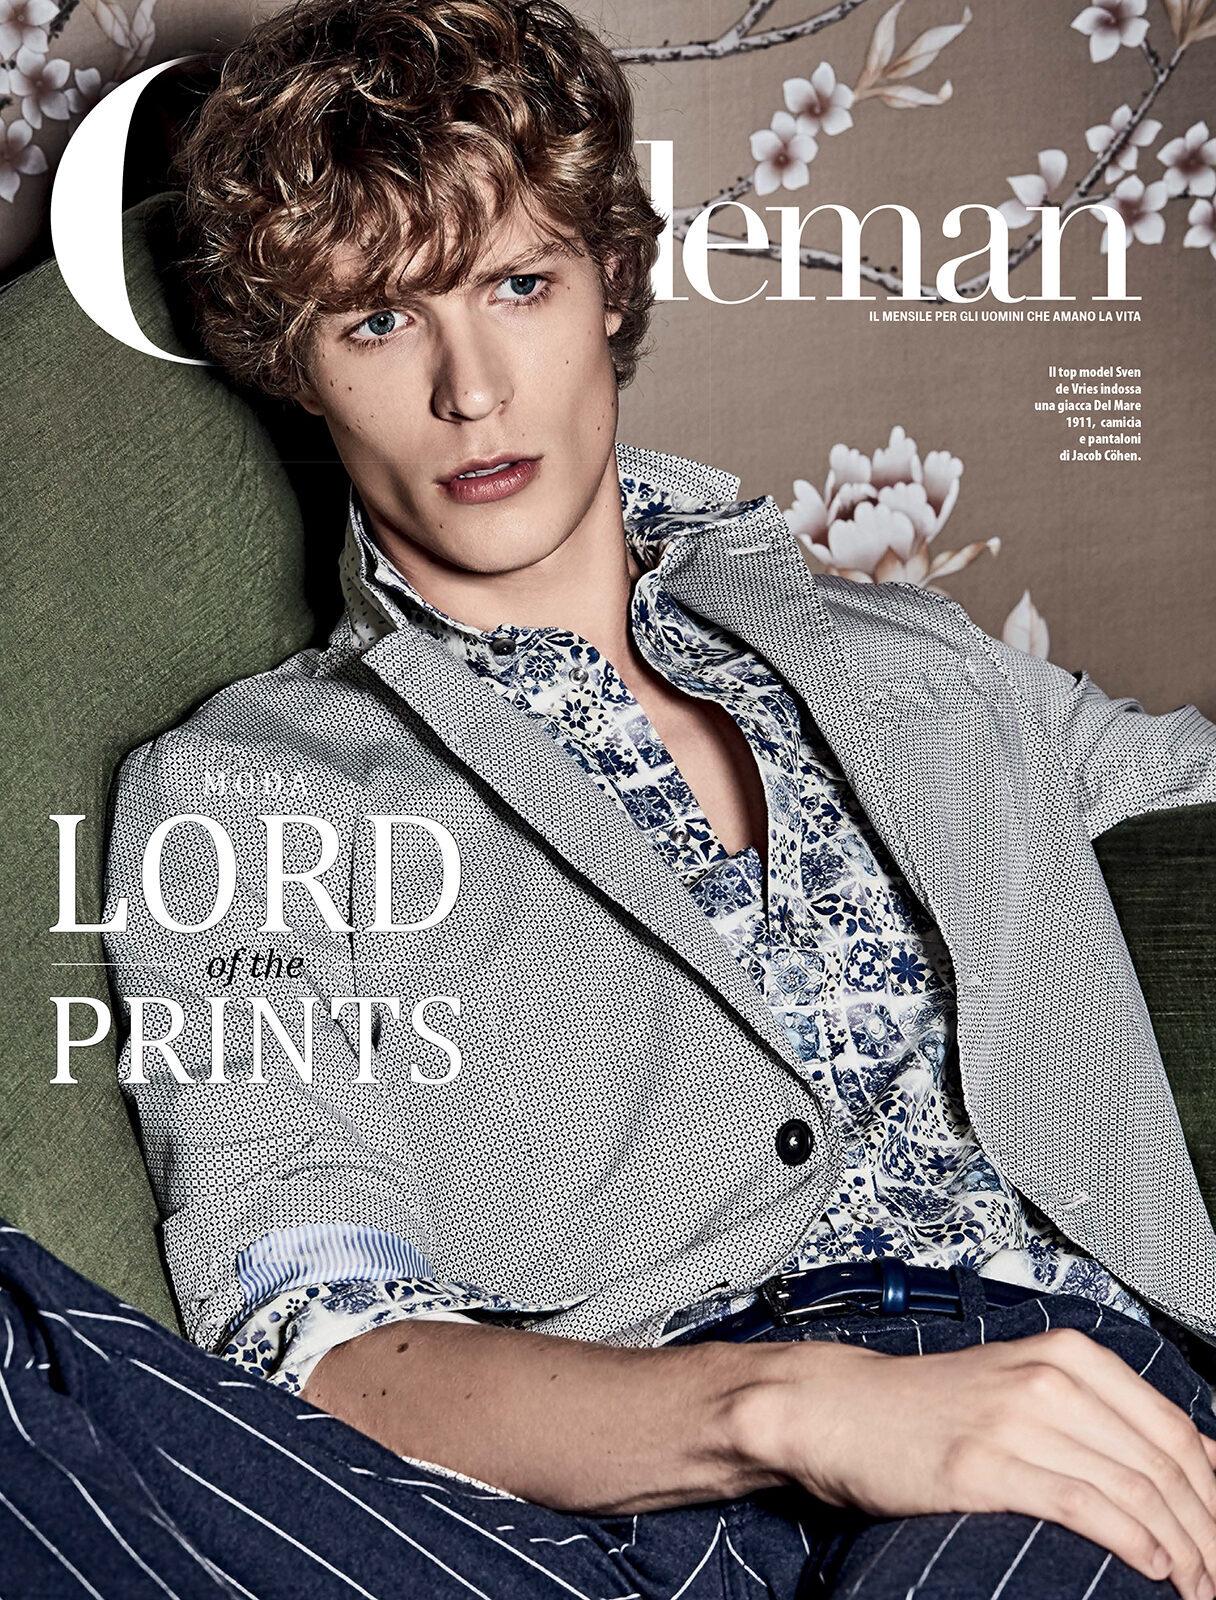 Gentleman Magazine Italia – Lord of the prints